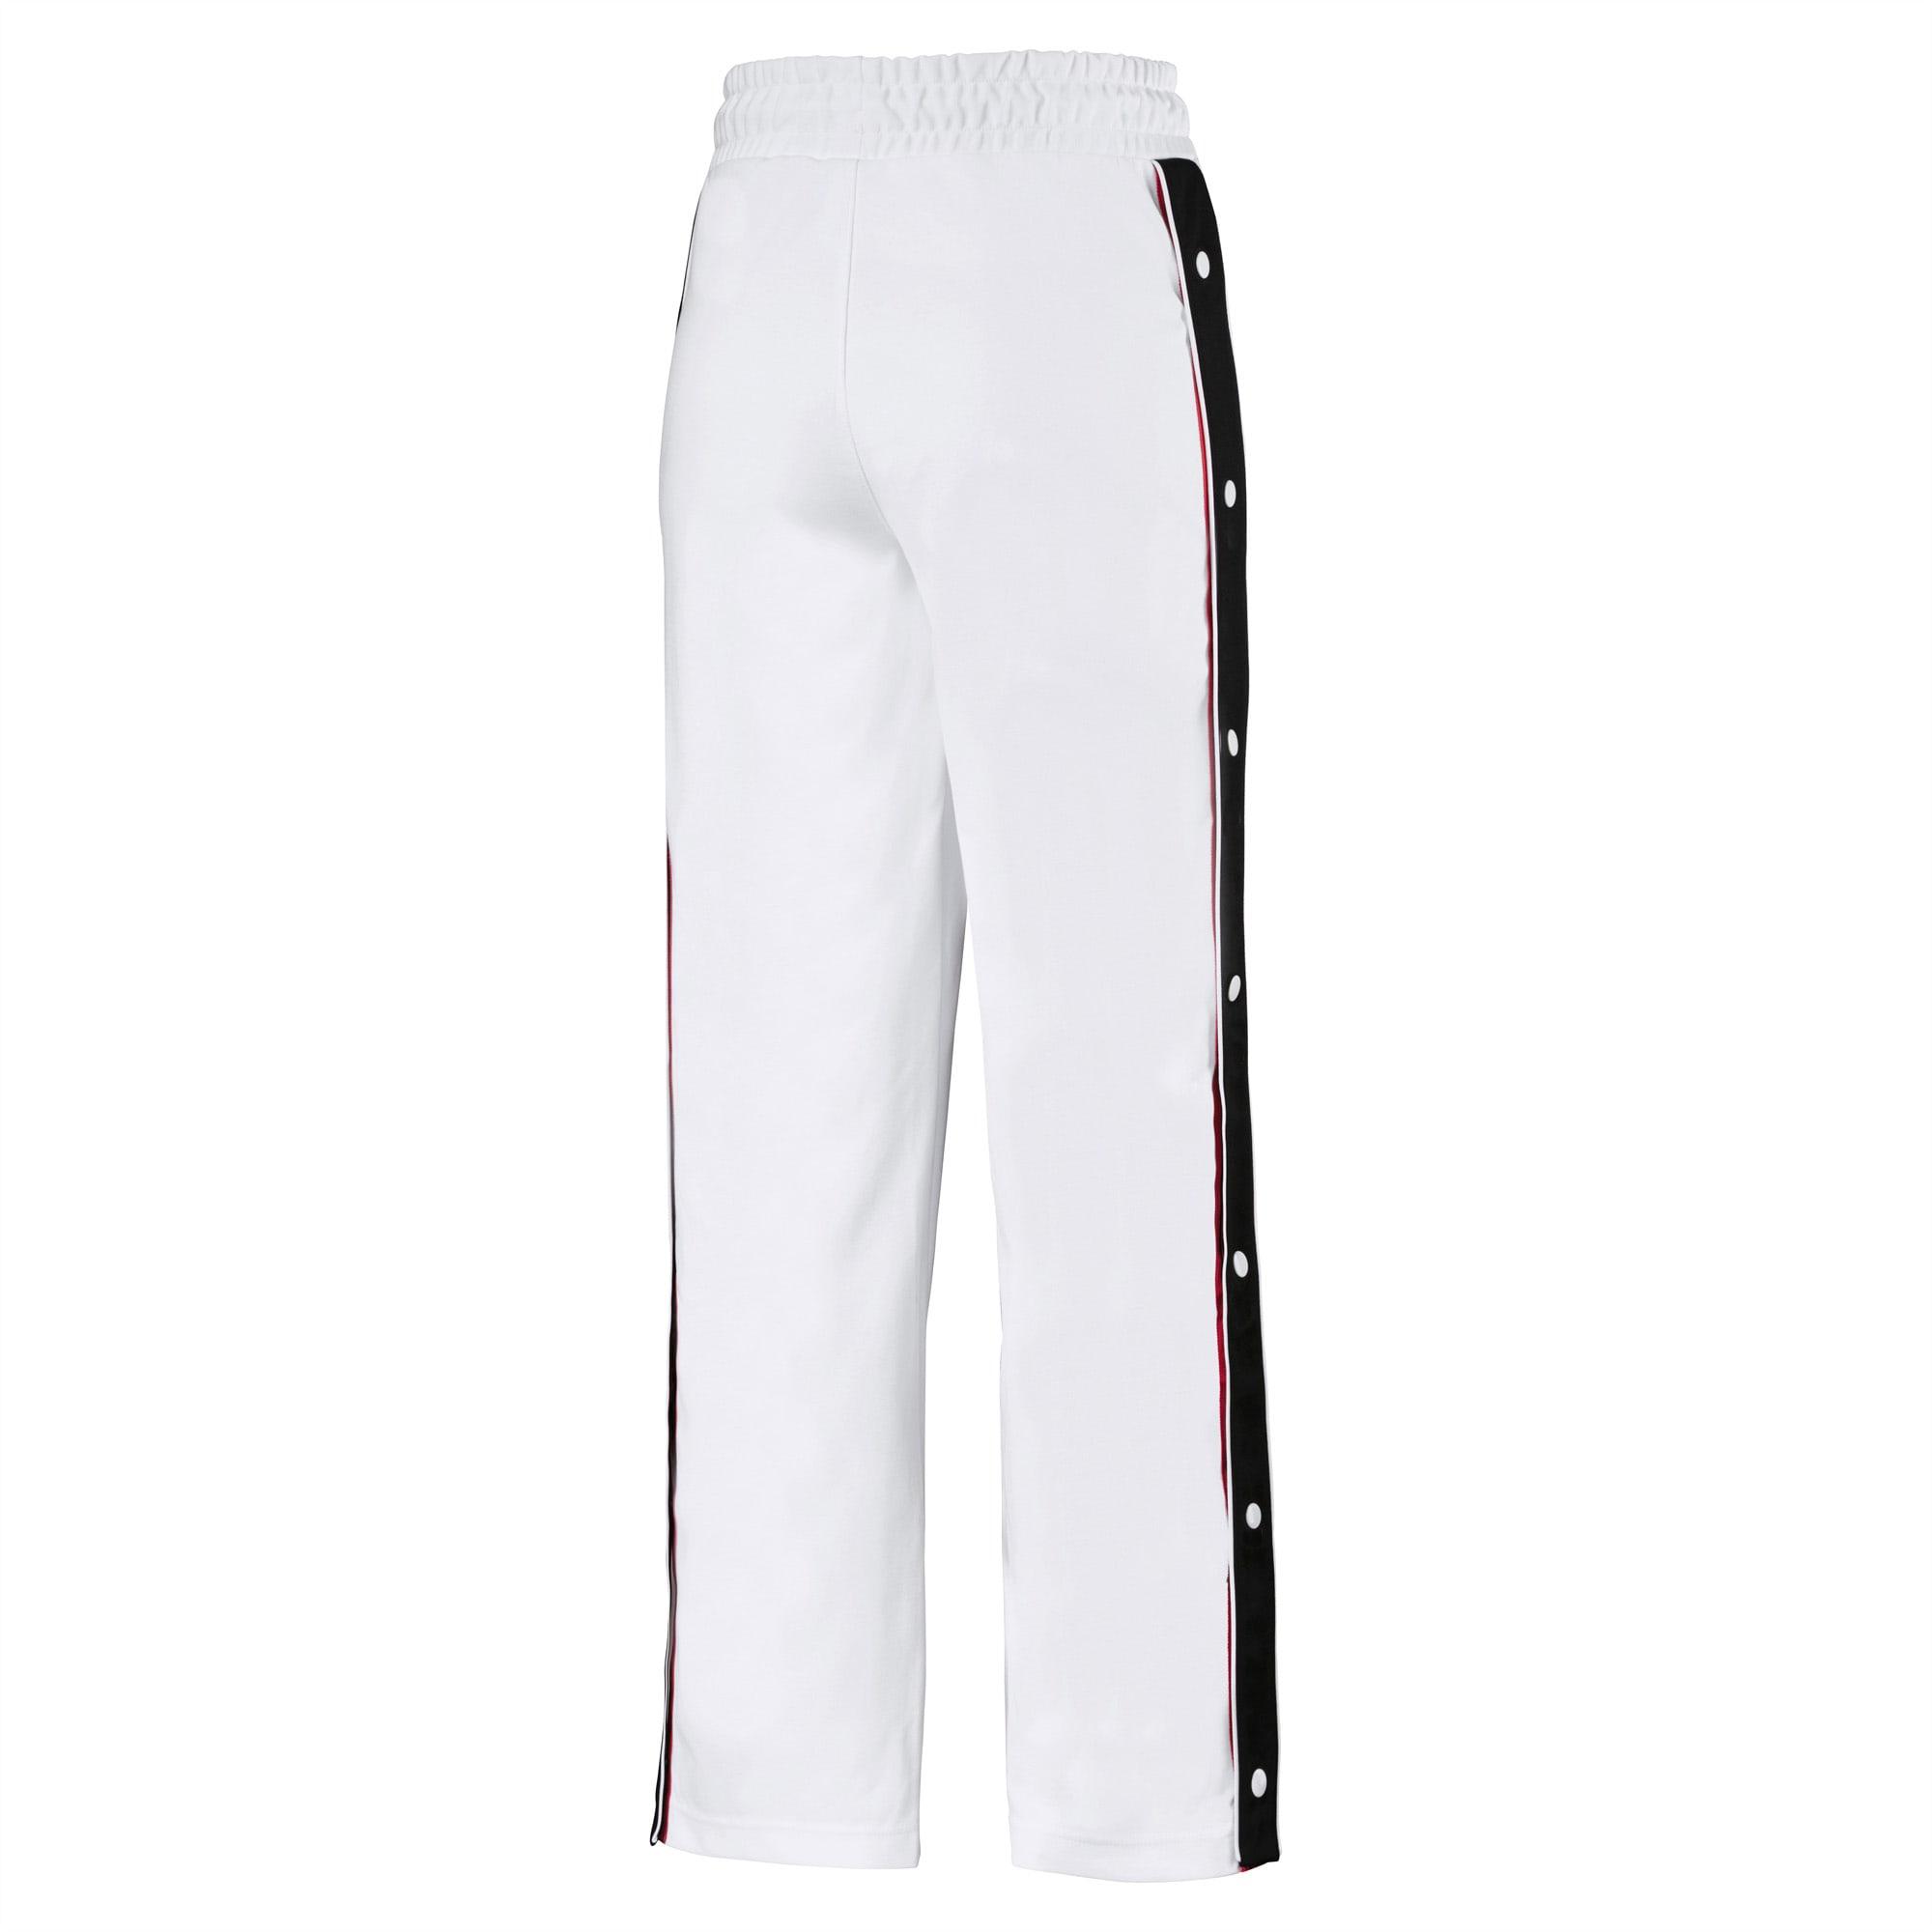 Pantaloni larghi da donna in maglia PUMA x KARL LAGERFELD